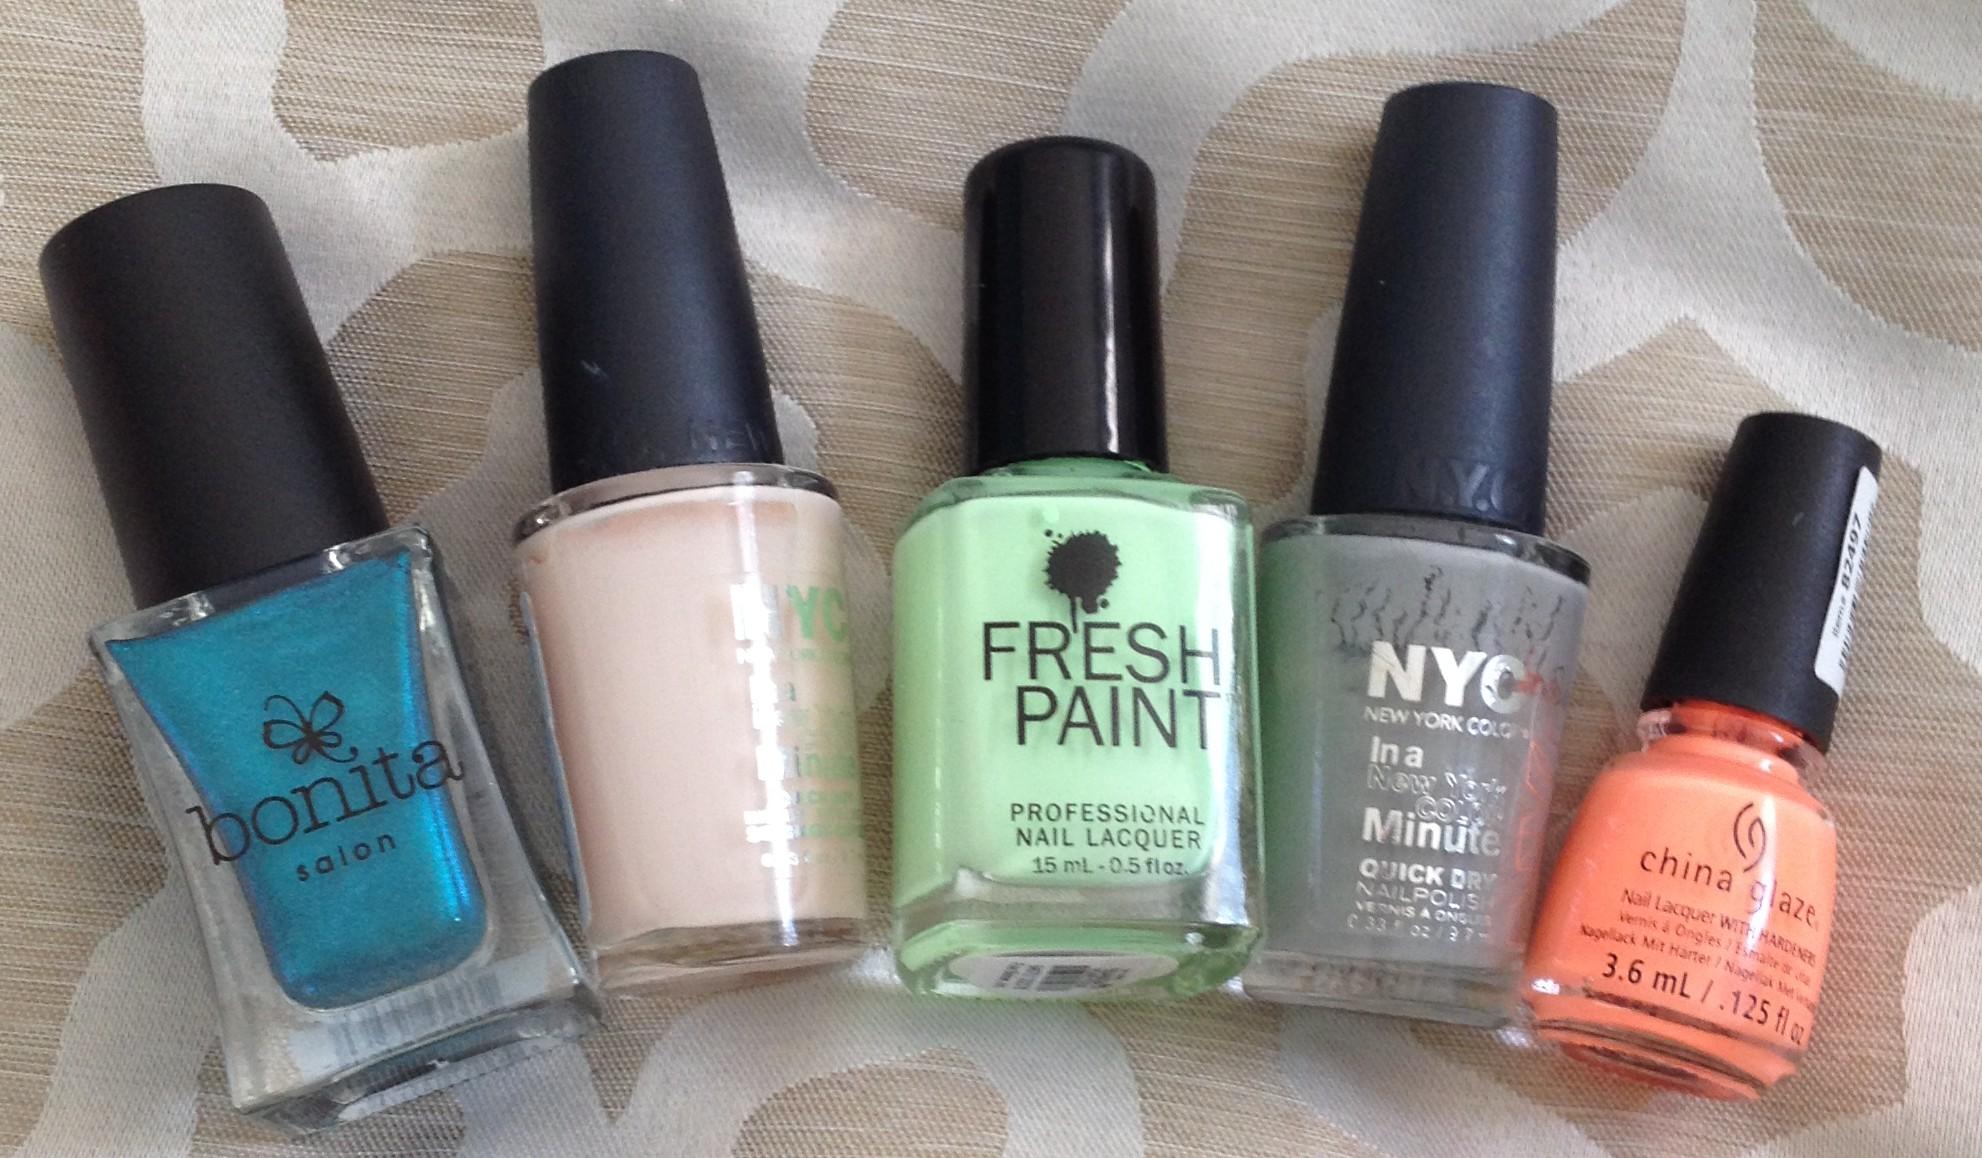 nyc nail polish – Polish Me Snazzy